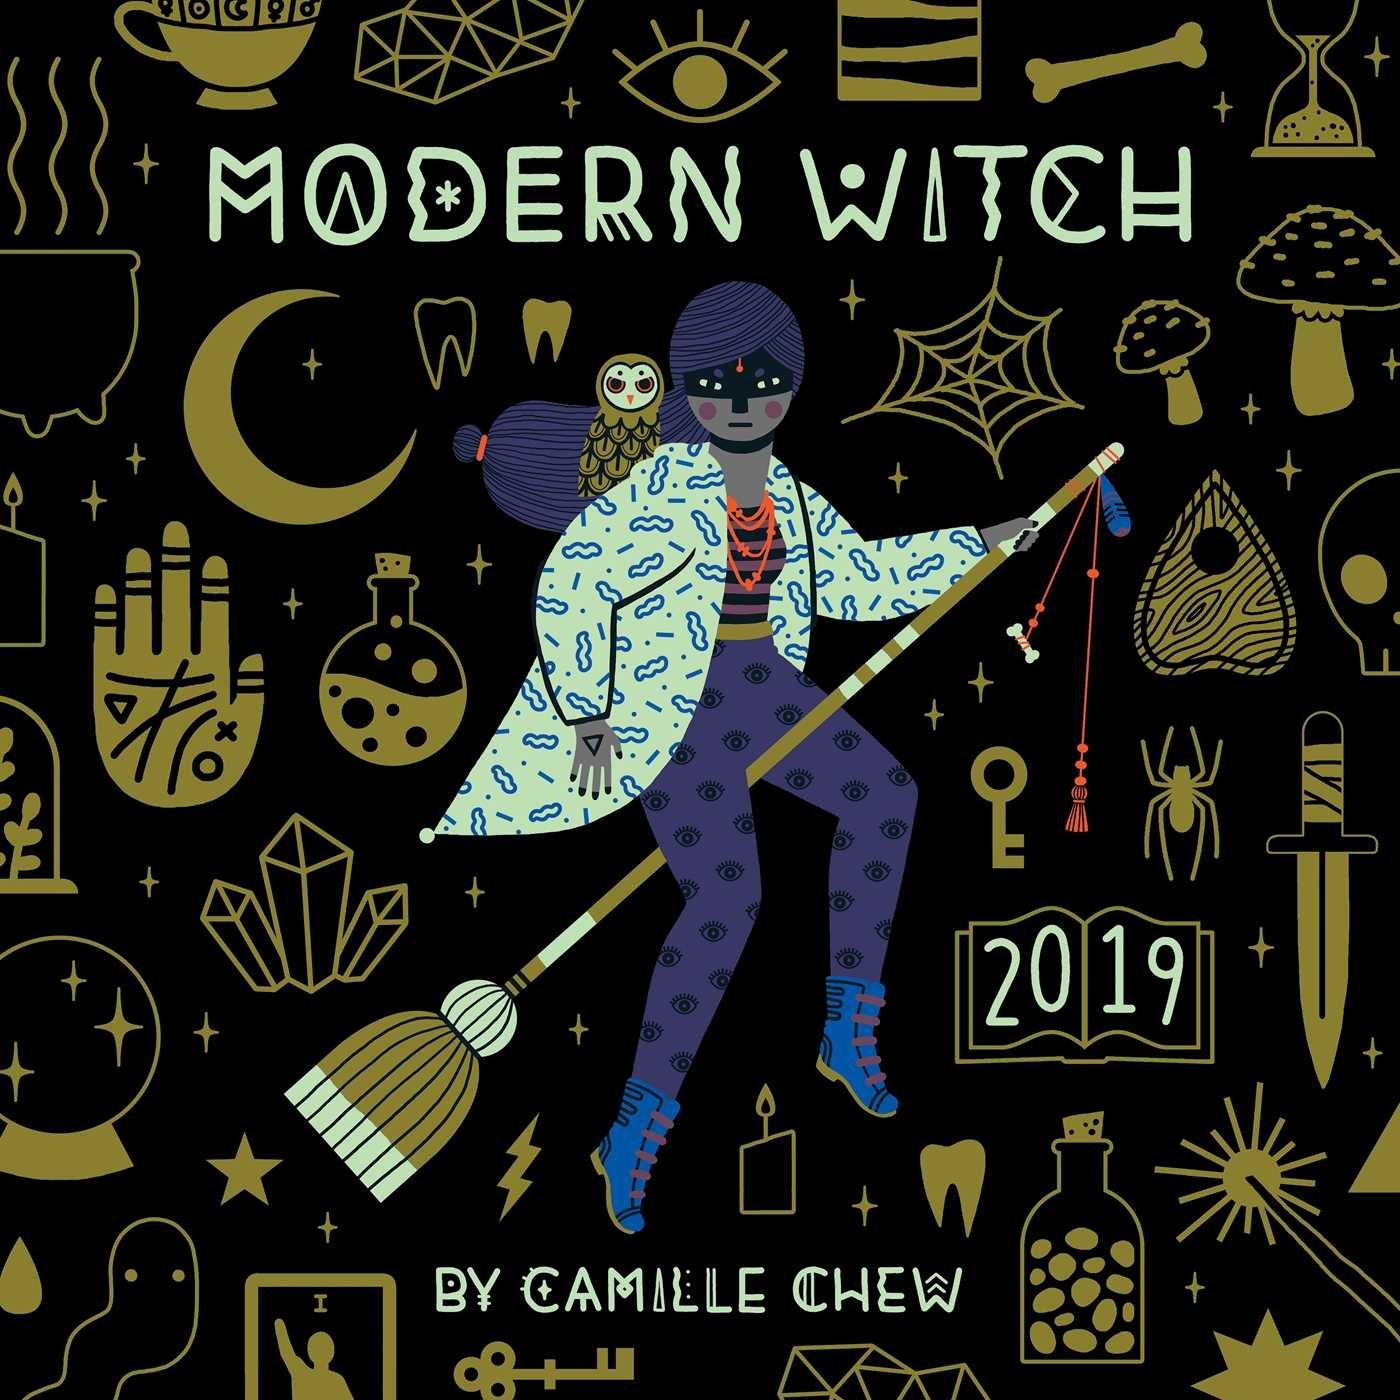 Modern Witch 2019 Wall Calendar: Camille Chew: 9781449494094: Amazon